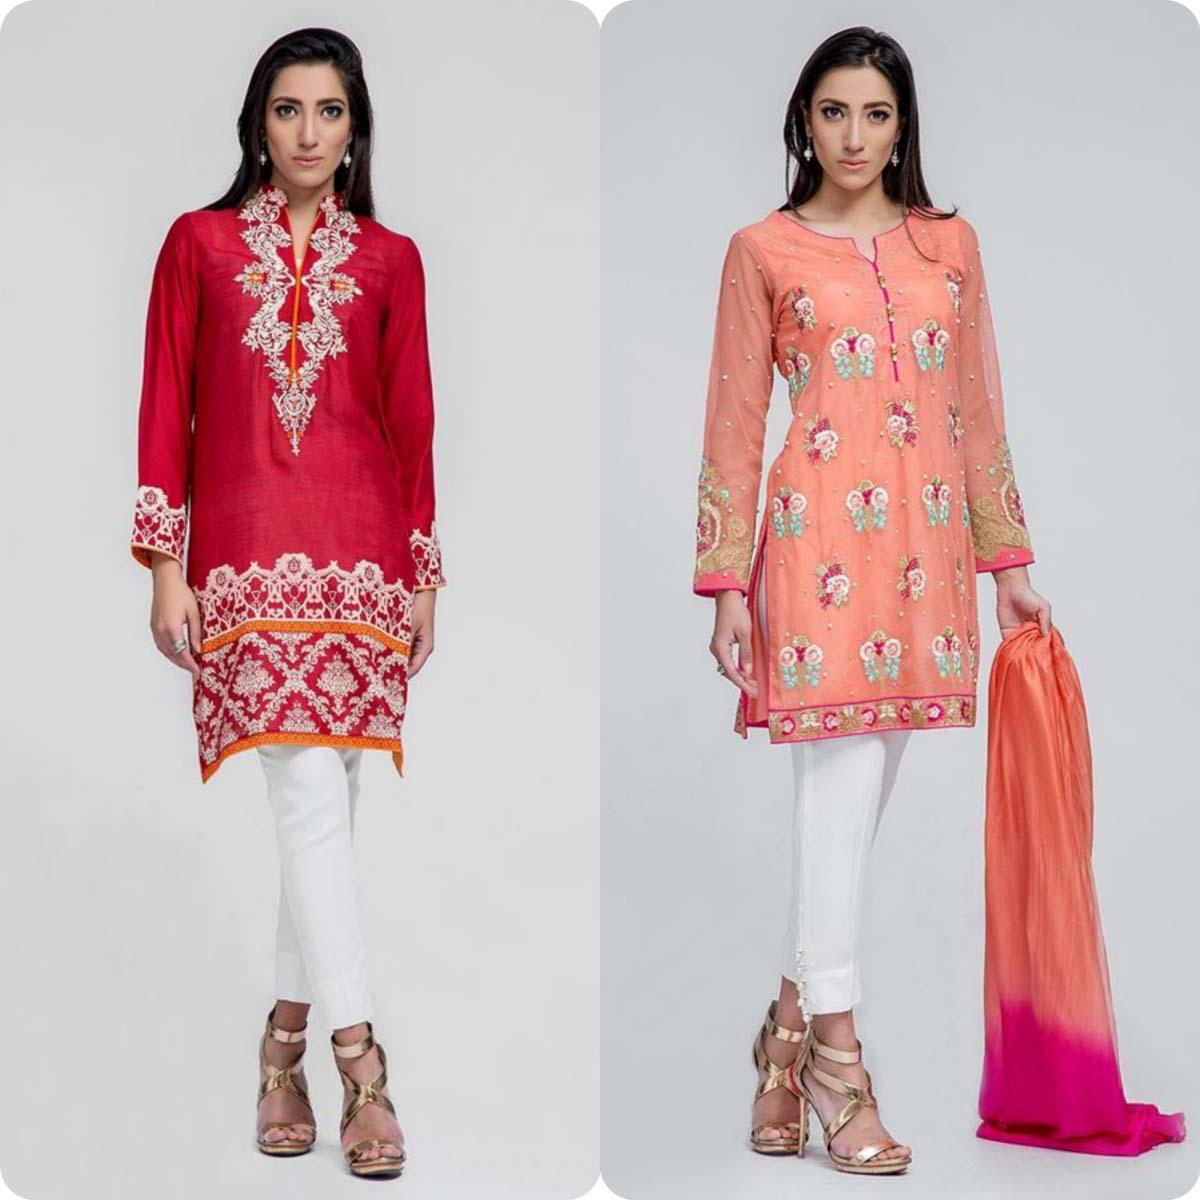 Deepak perwani Luxury Pret Eid Collection for Men and Women 2016-2017 (16)